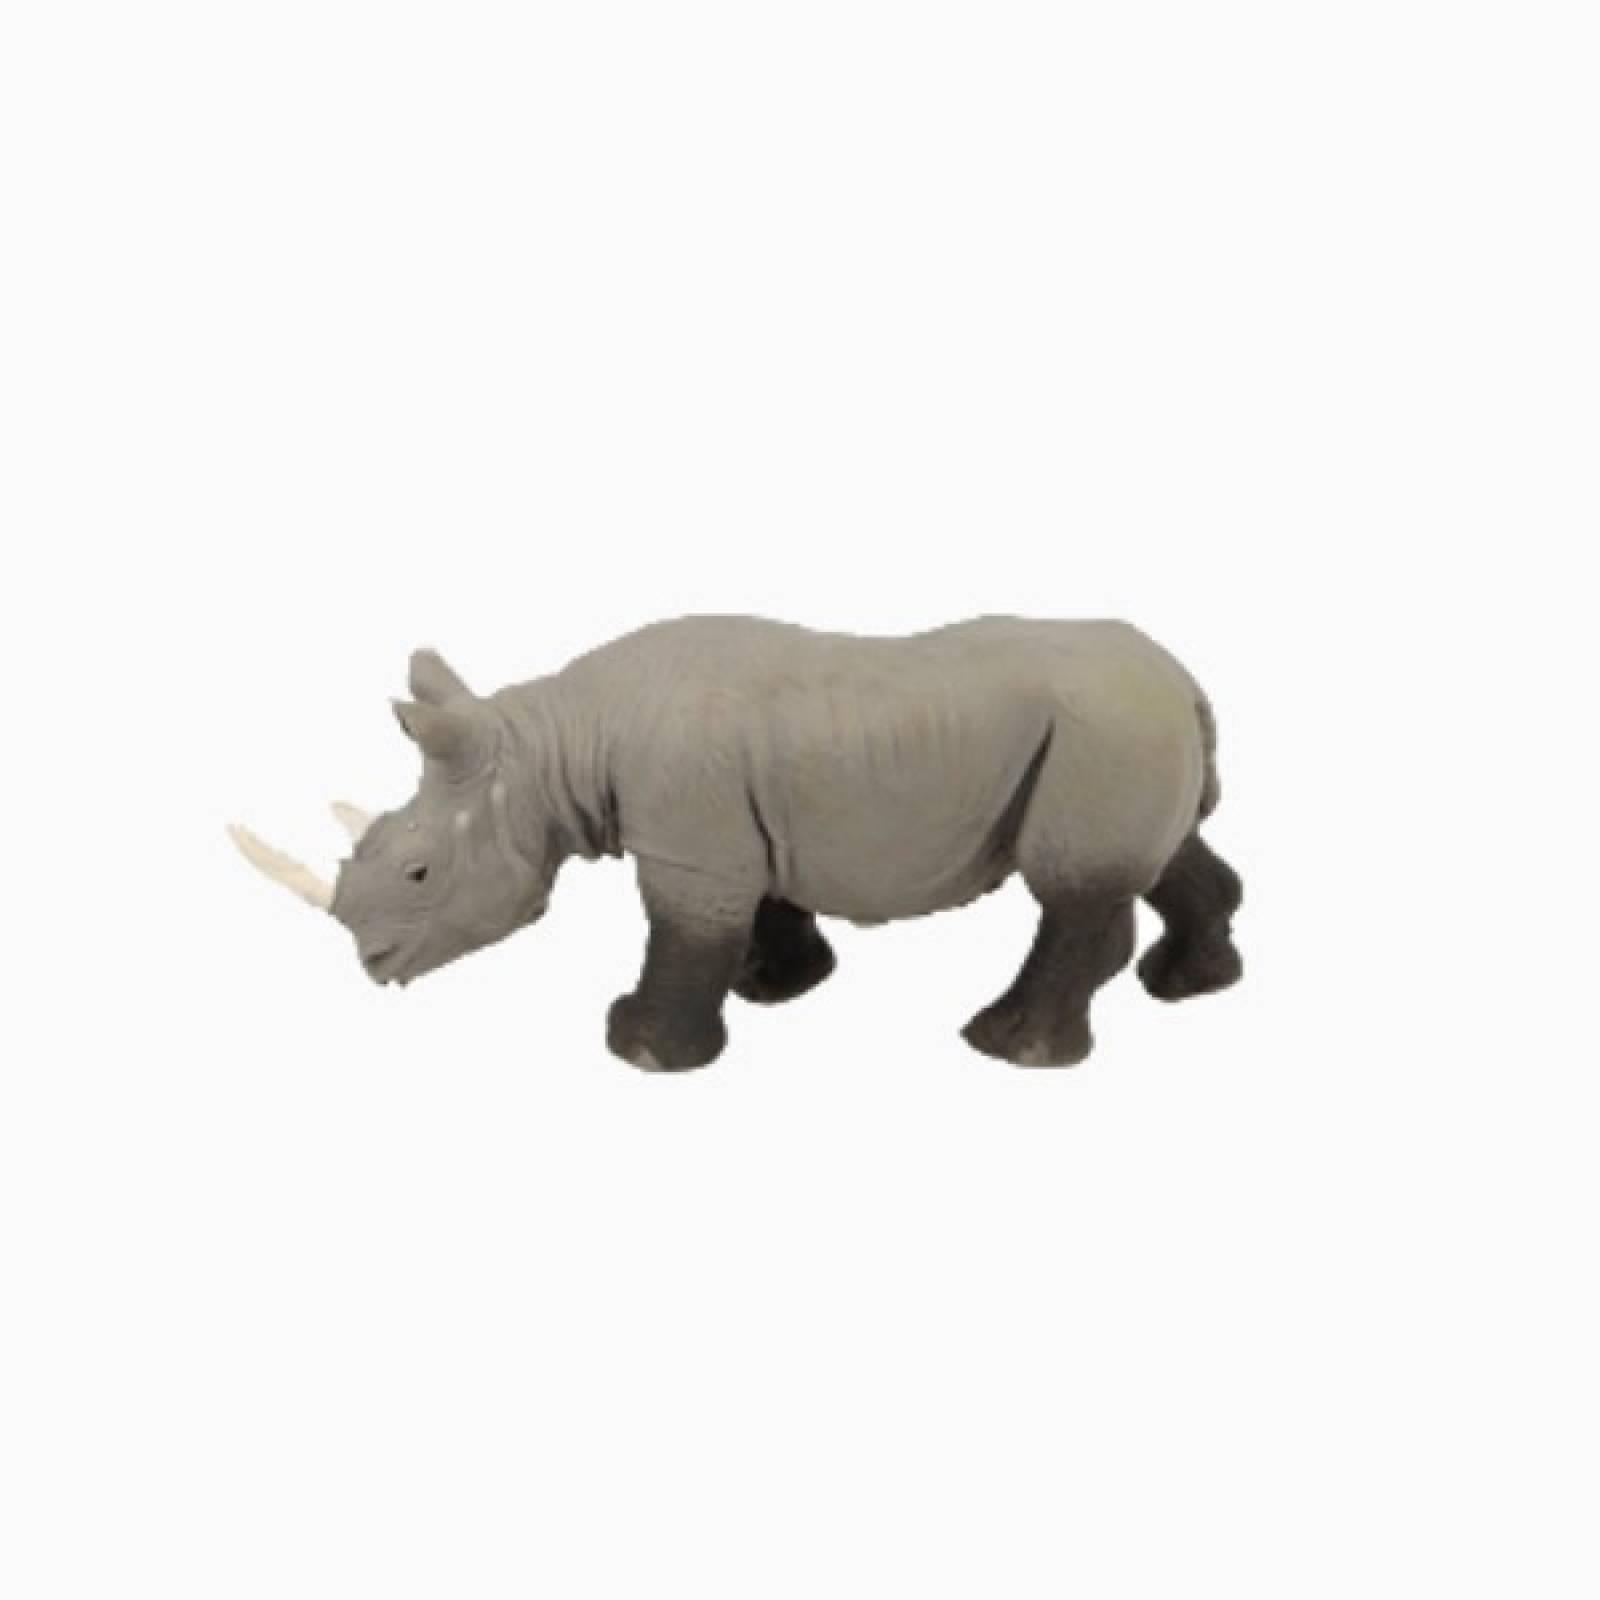 Rhino Stretchy Beanie Animal Toy 3+